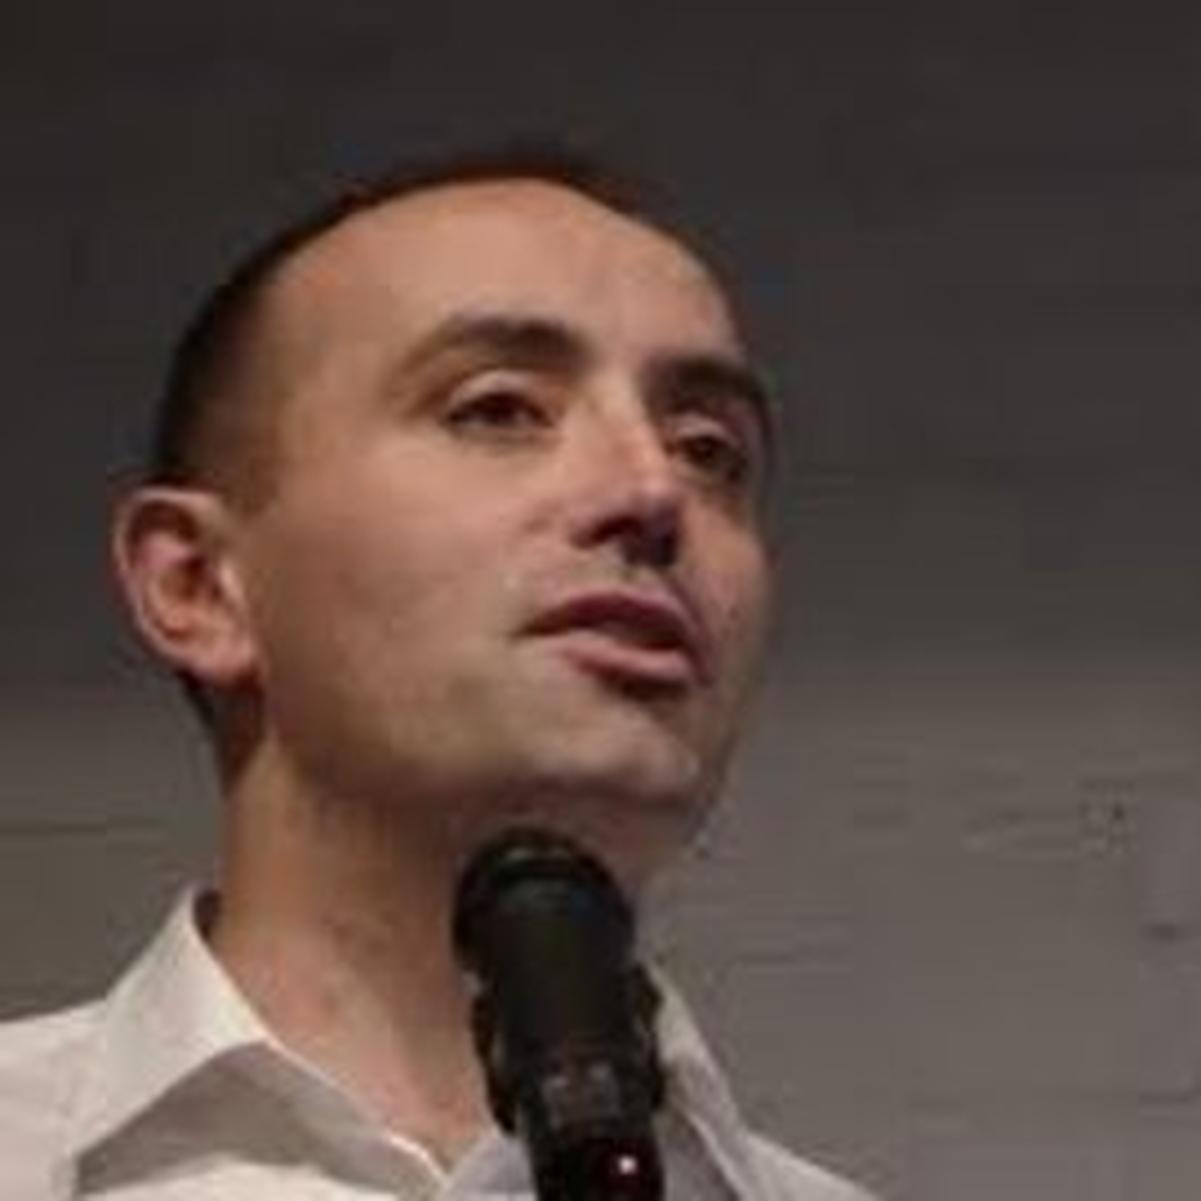 Simon McDermott